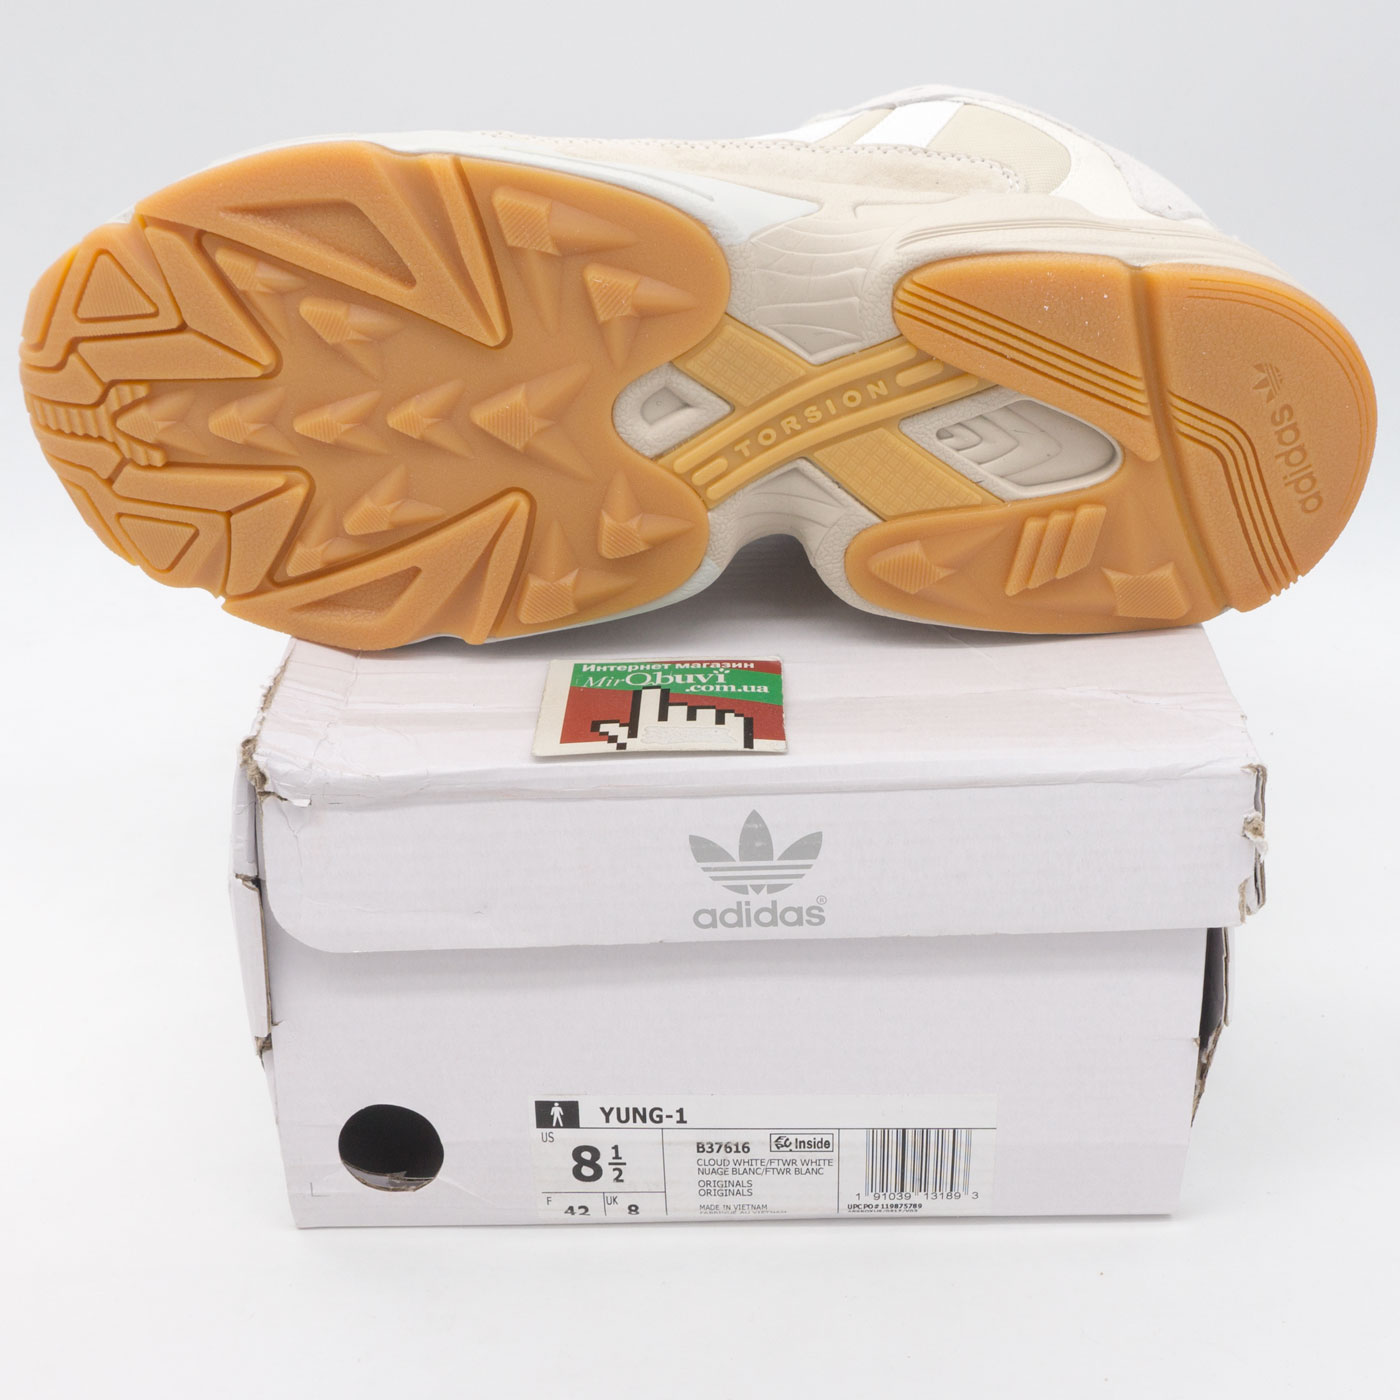 фото back Кроссовки Adidas Yung-1 бежевые, натуральная замша. Топ качество! back